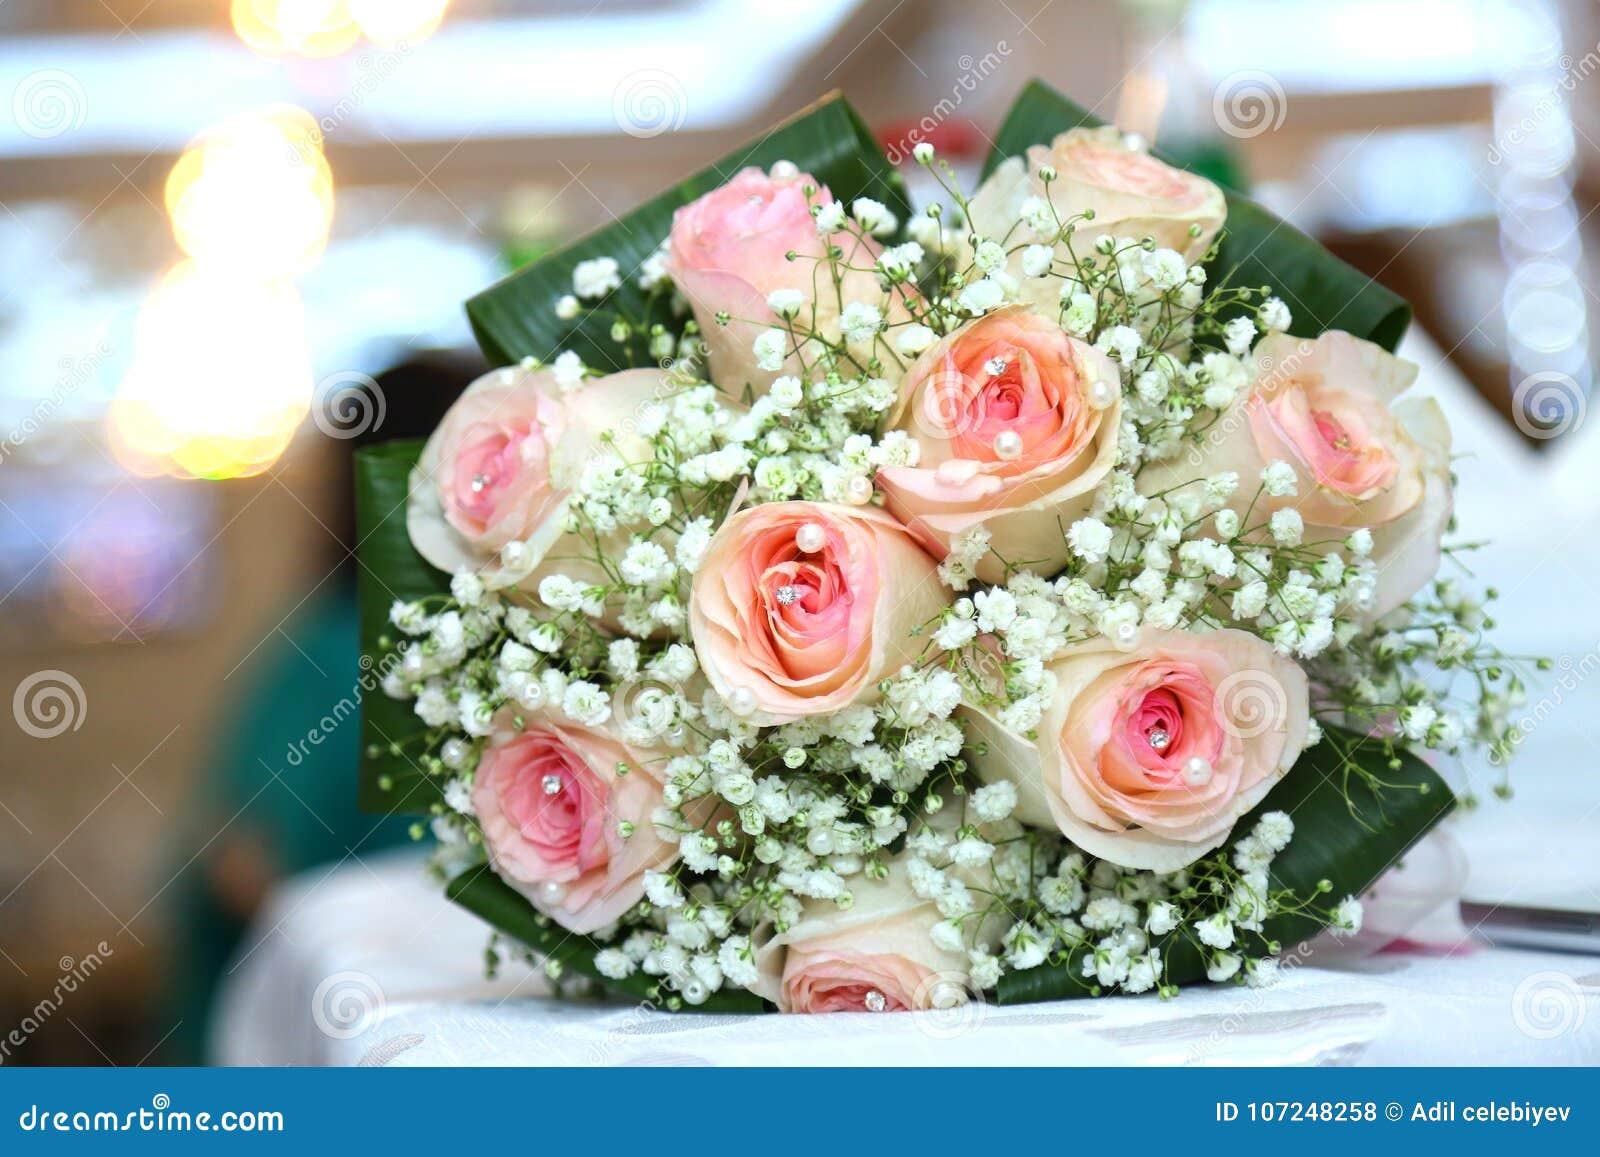 3173c6c8603d Άσπρη ανθοδέσμη λουλουδιών γάμου και δέσμευσης Όμορφη γαμήλια ανθοδέσμη με  τα διαφορετικά λουλούδια